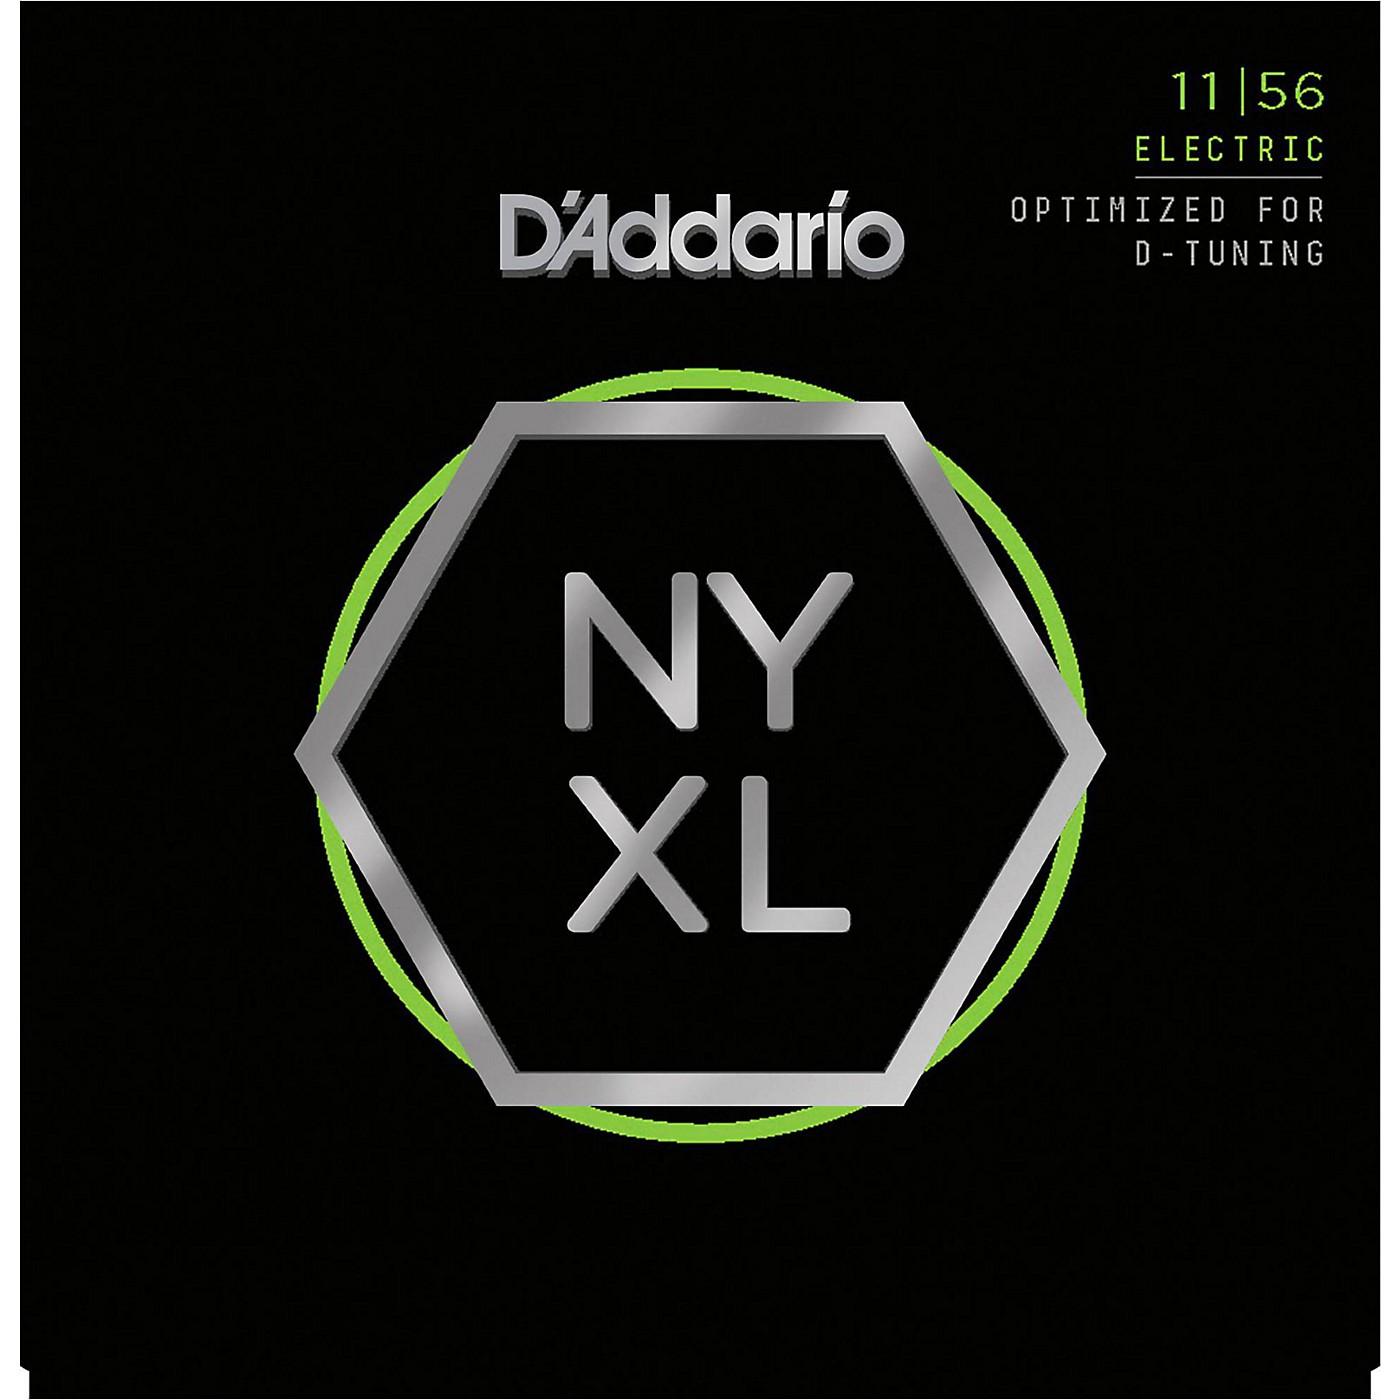 D'Addario NYXL1156 Medium Top/Extra Heavy Bottom Electric Guitar Strings thumbnail